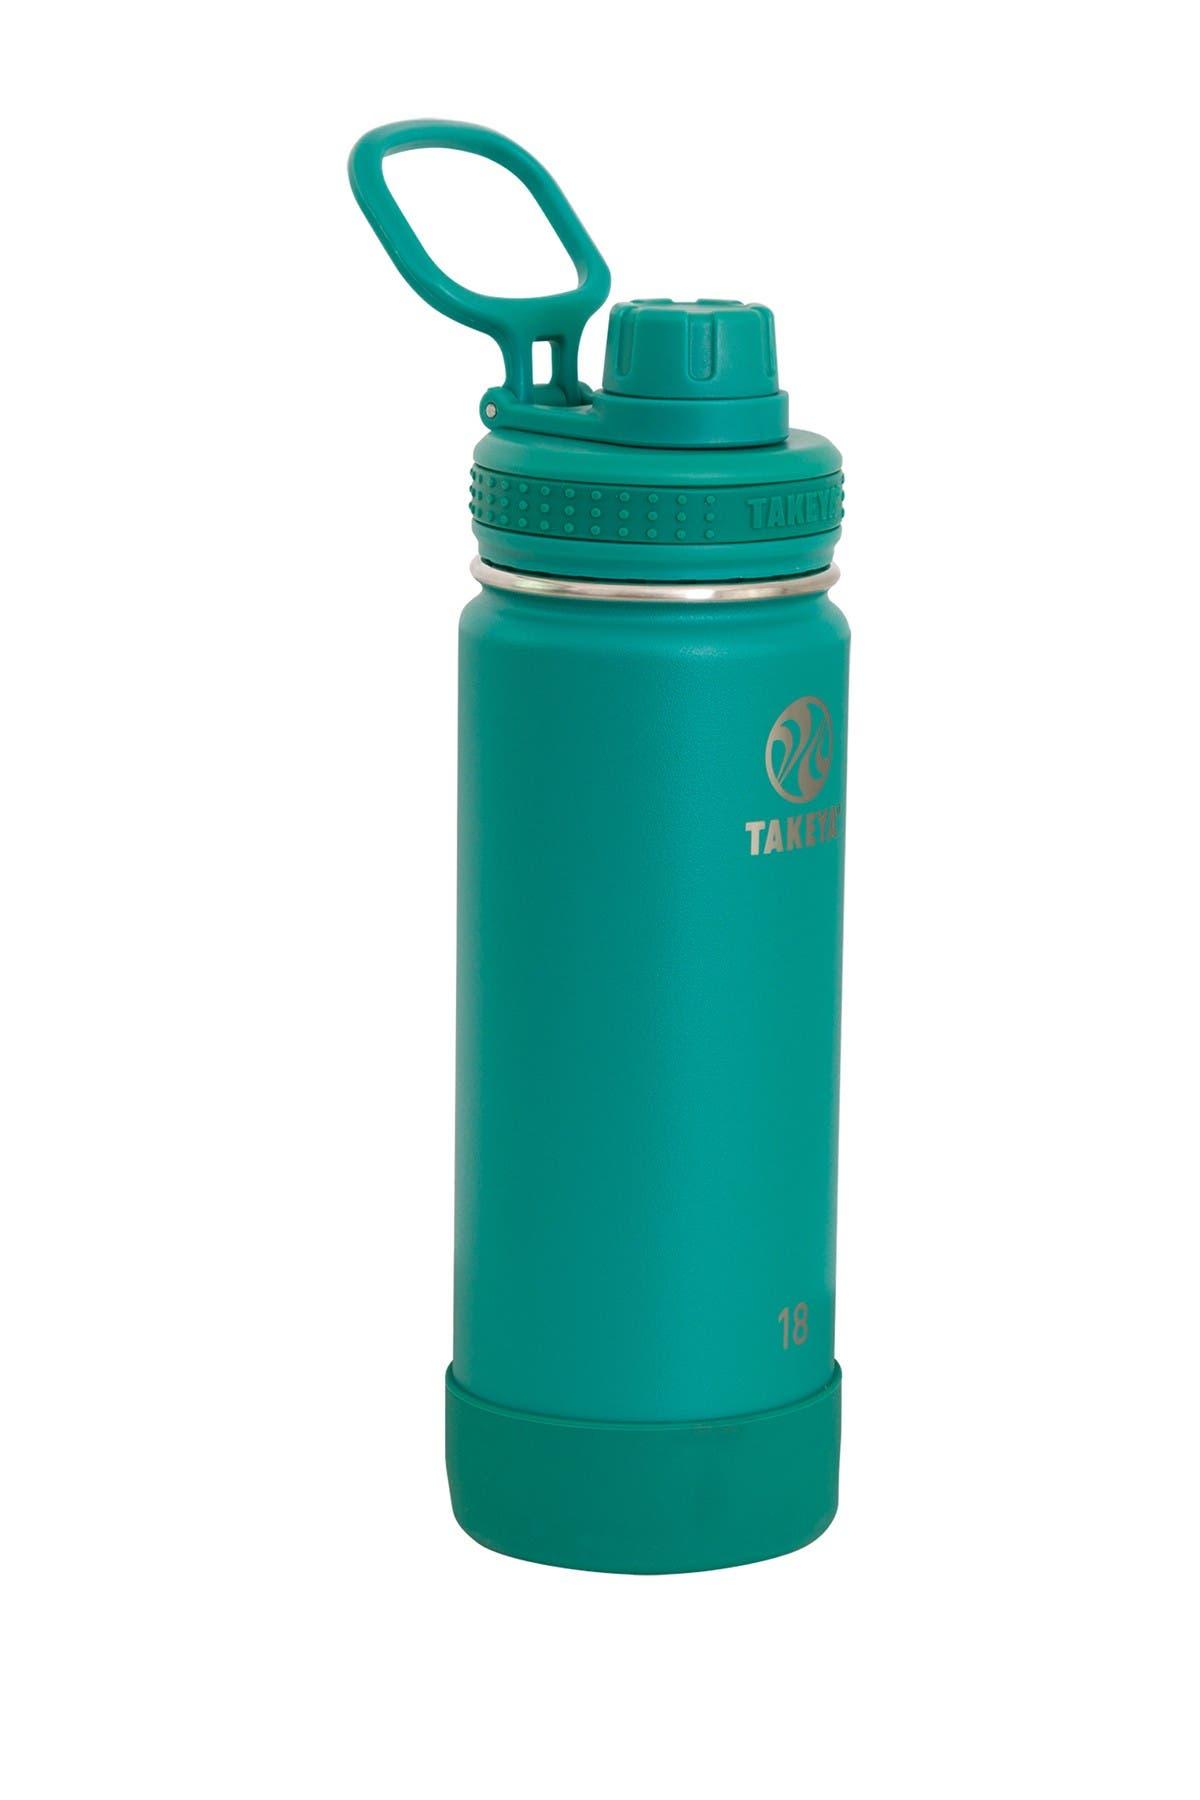 Image of Takeya Actives 18 oz. Spout Bottle - Evergreen